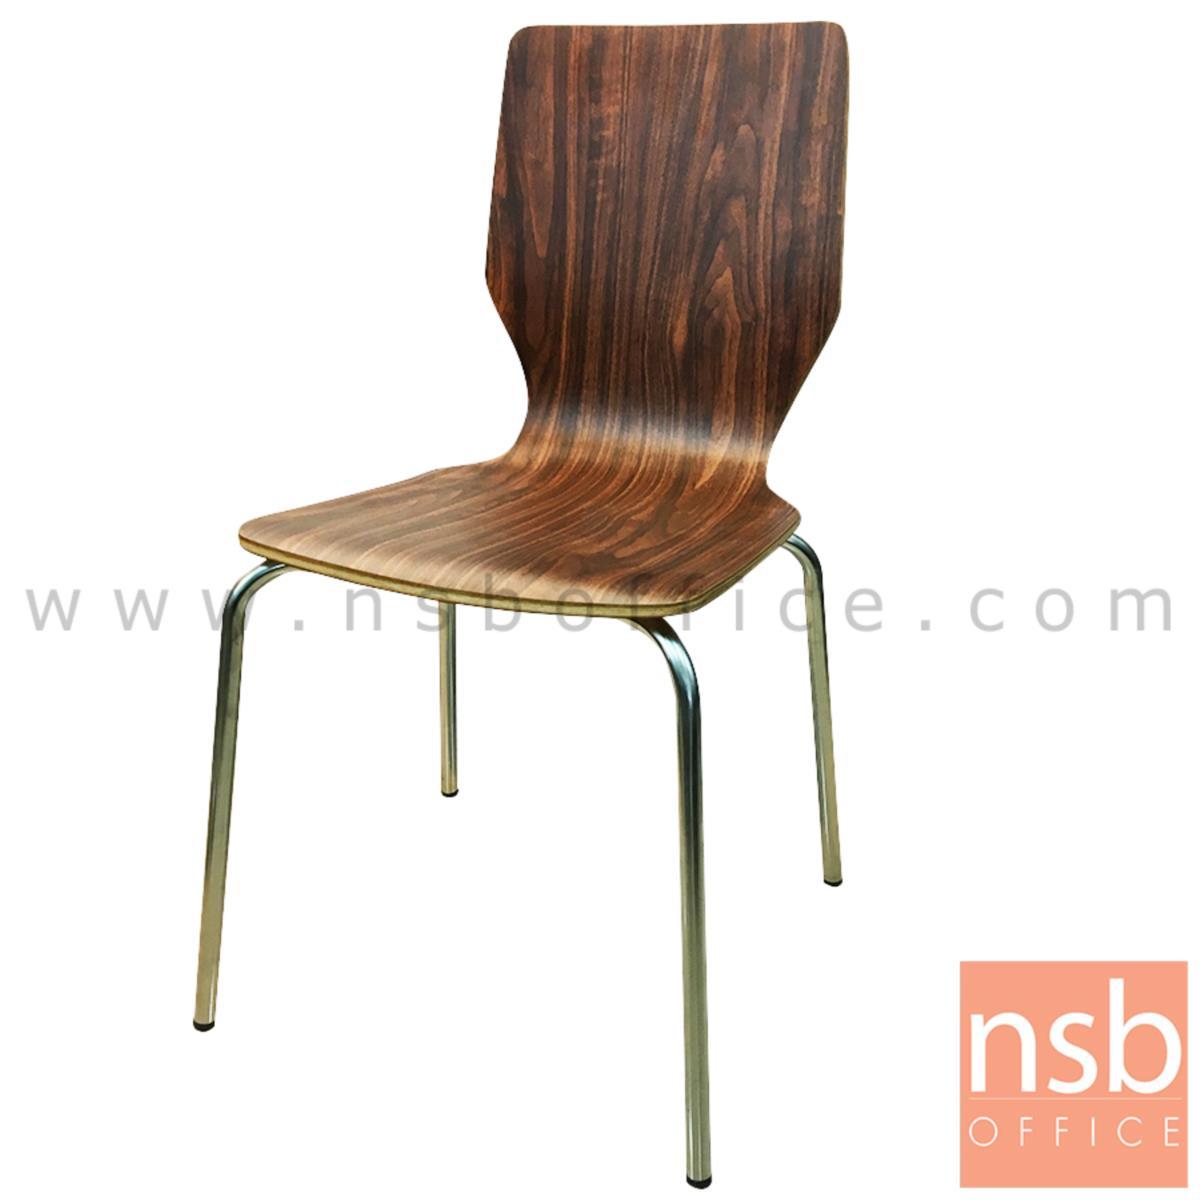 B20A077:เก้าอี้อเนกประสงค์ไม้ดัด รุ่น Axl (แอกเซล) ขนาด 82H cm.  ขาสแตนเลส